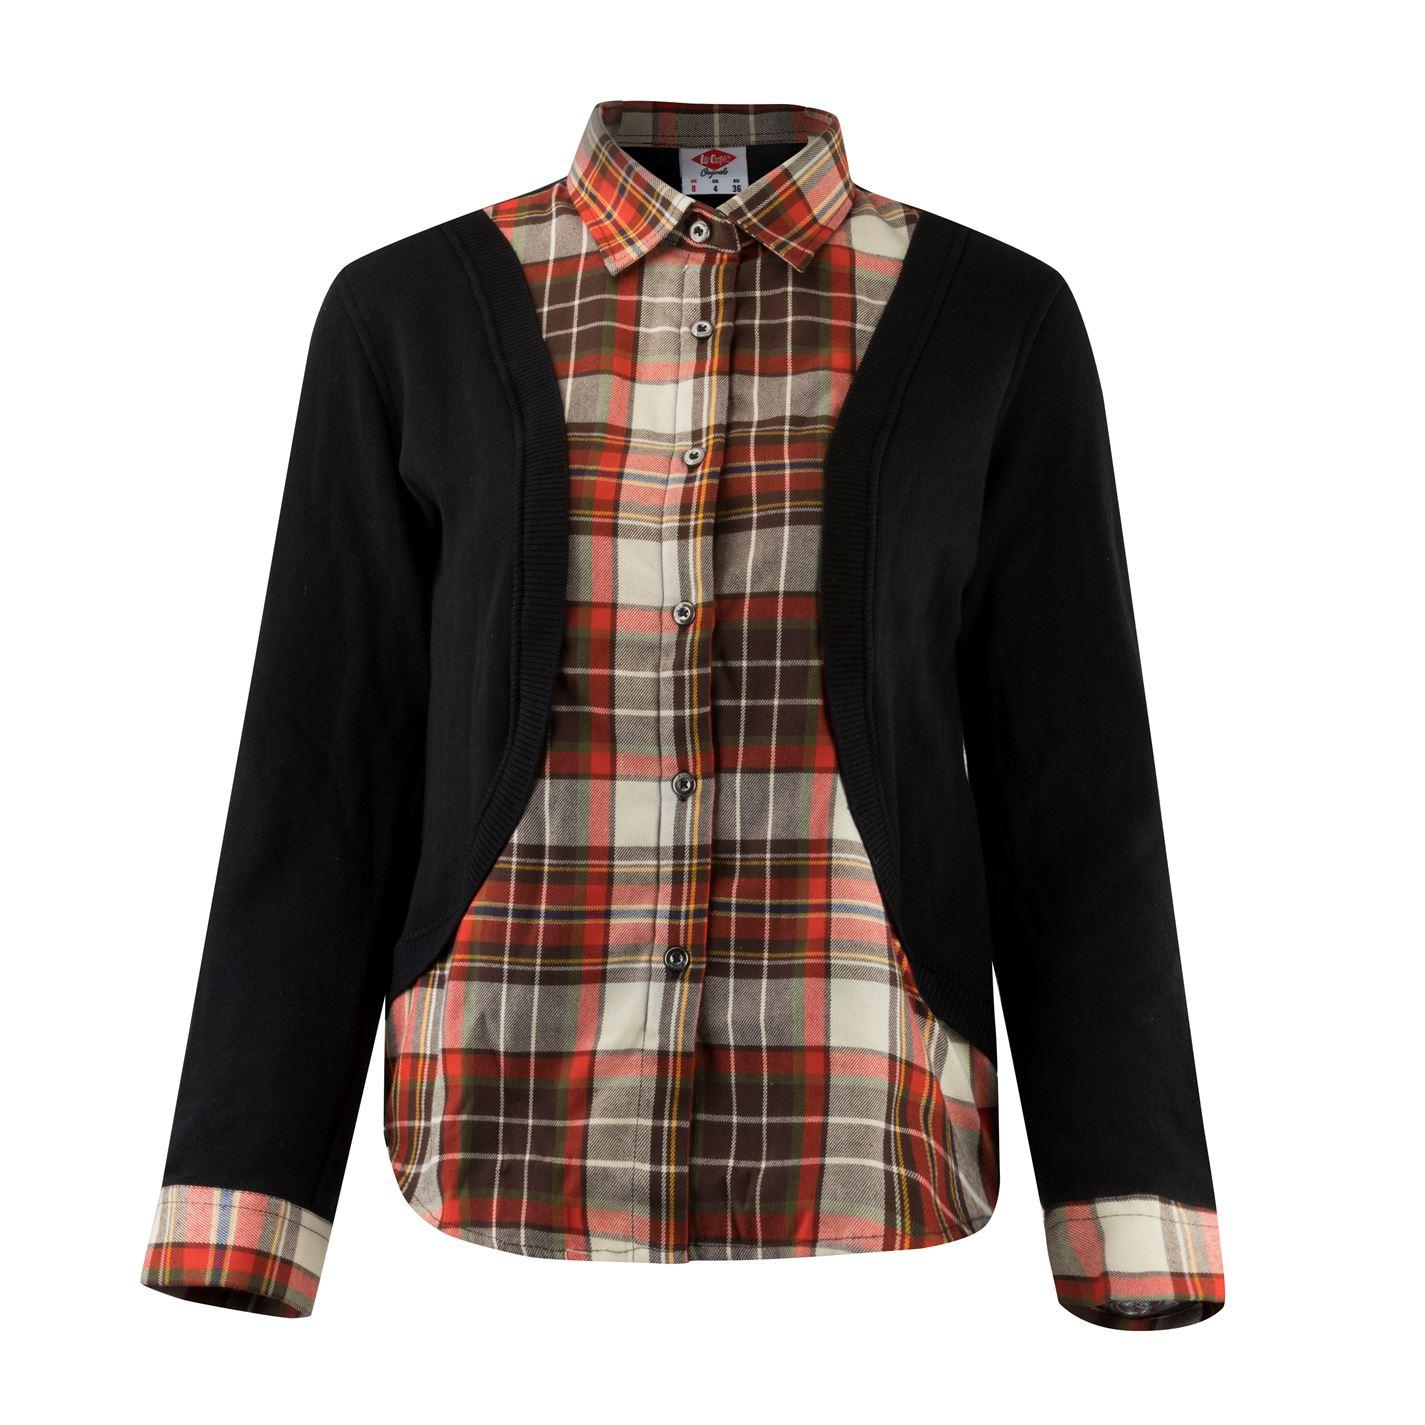 Lee Cooper Check Shirt and Cardigan Ladies